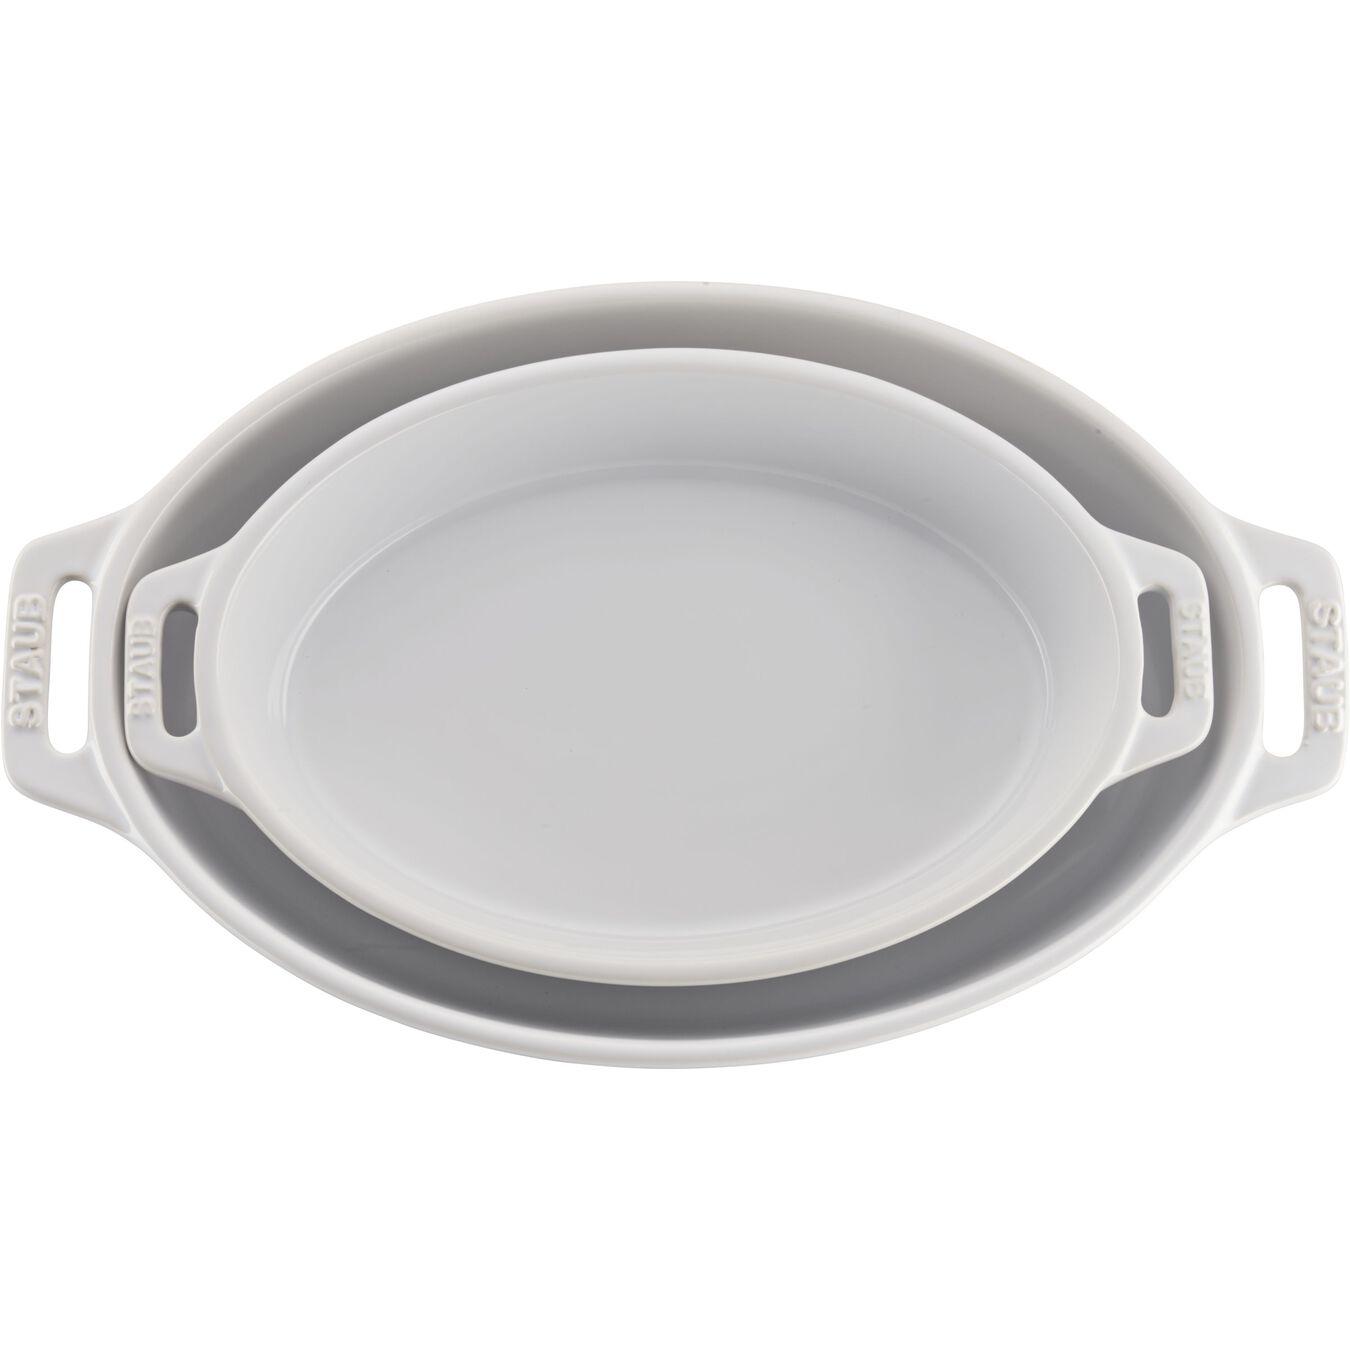 2-pc, oval, Bakeware set, white,,large 1